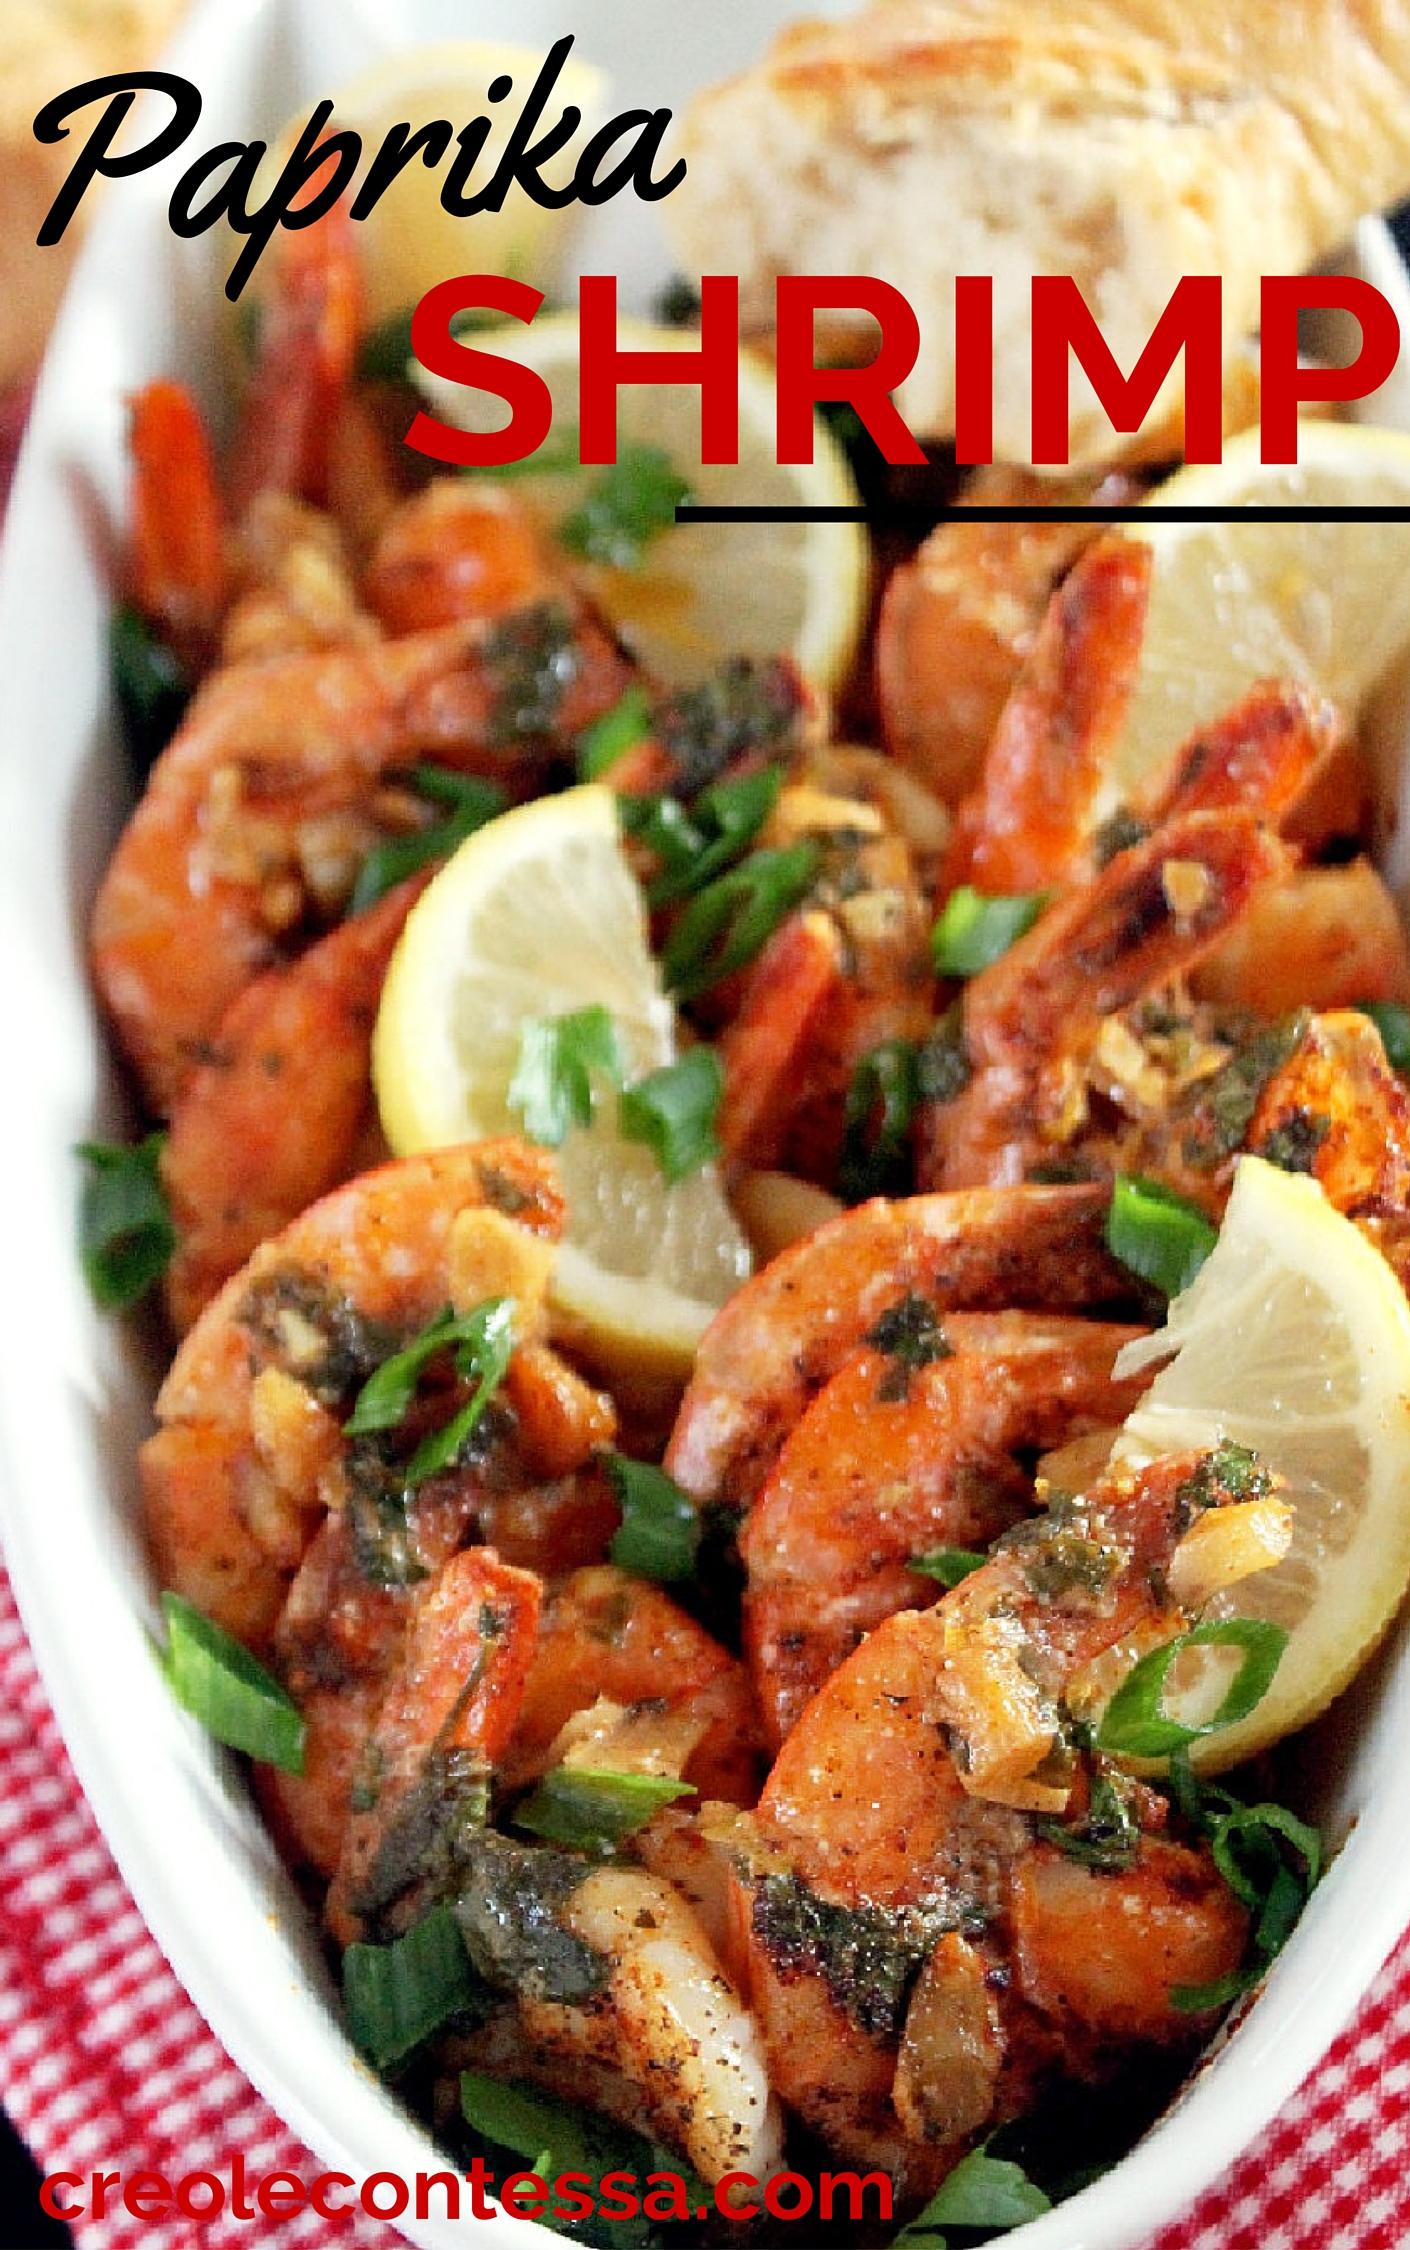 Paprika Shrimp with Roasted Garlic-Creole Contessa